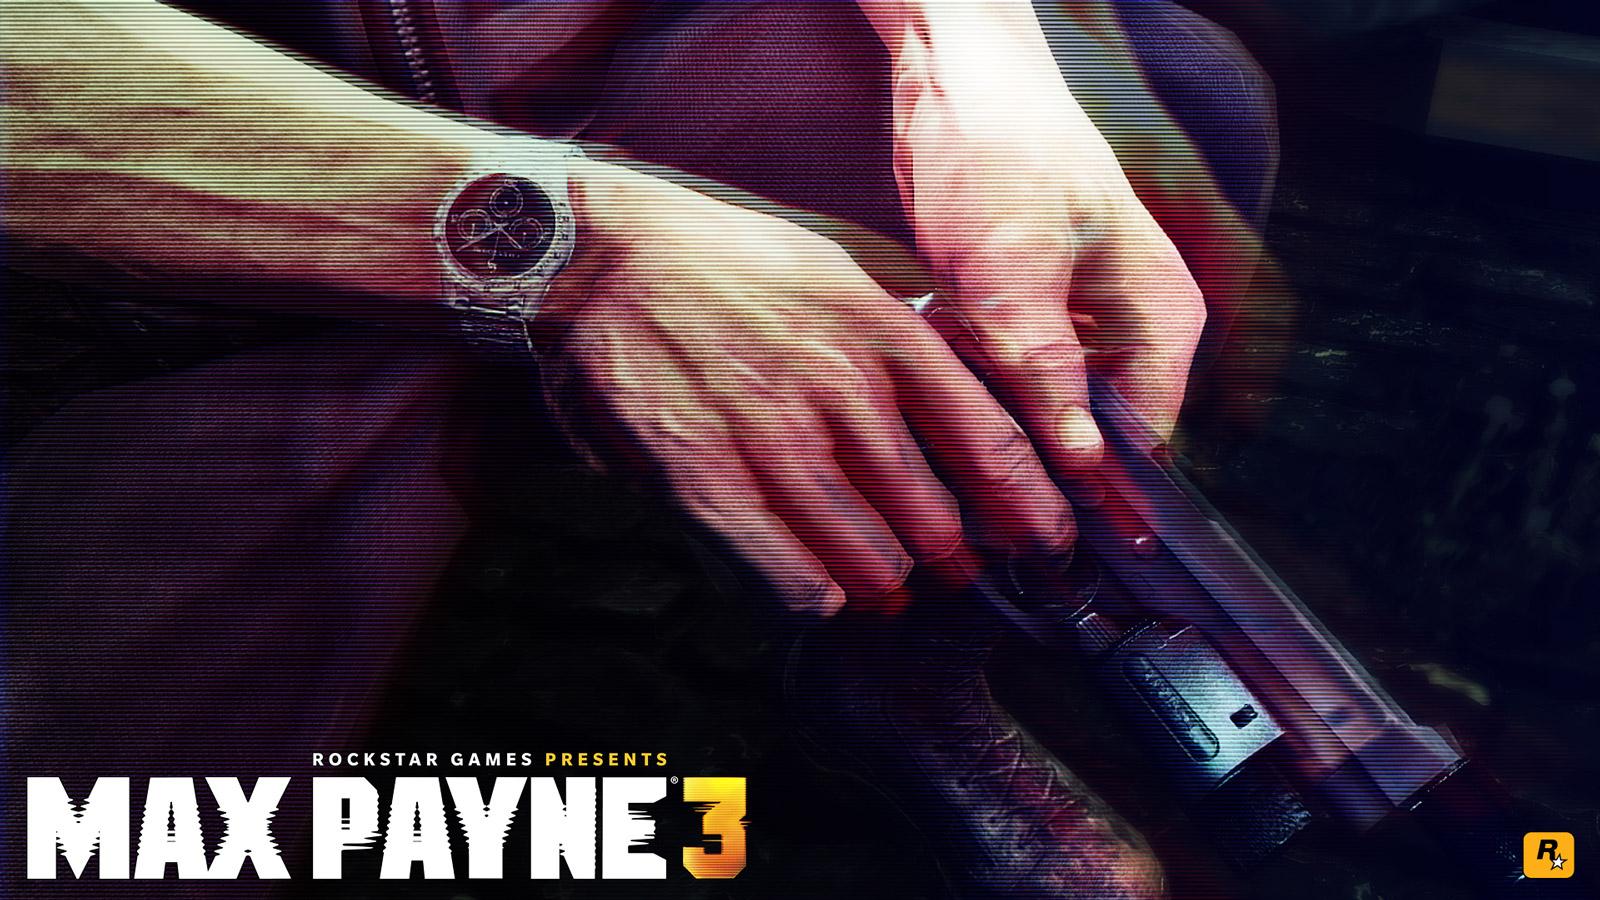 Max Payne 3 Wallpaper in 1600x900